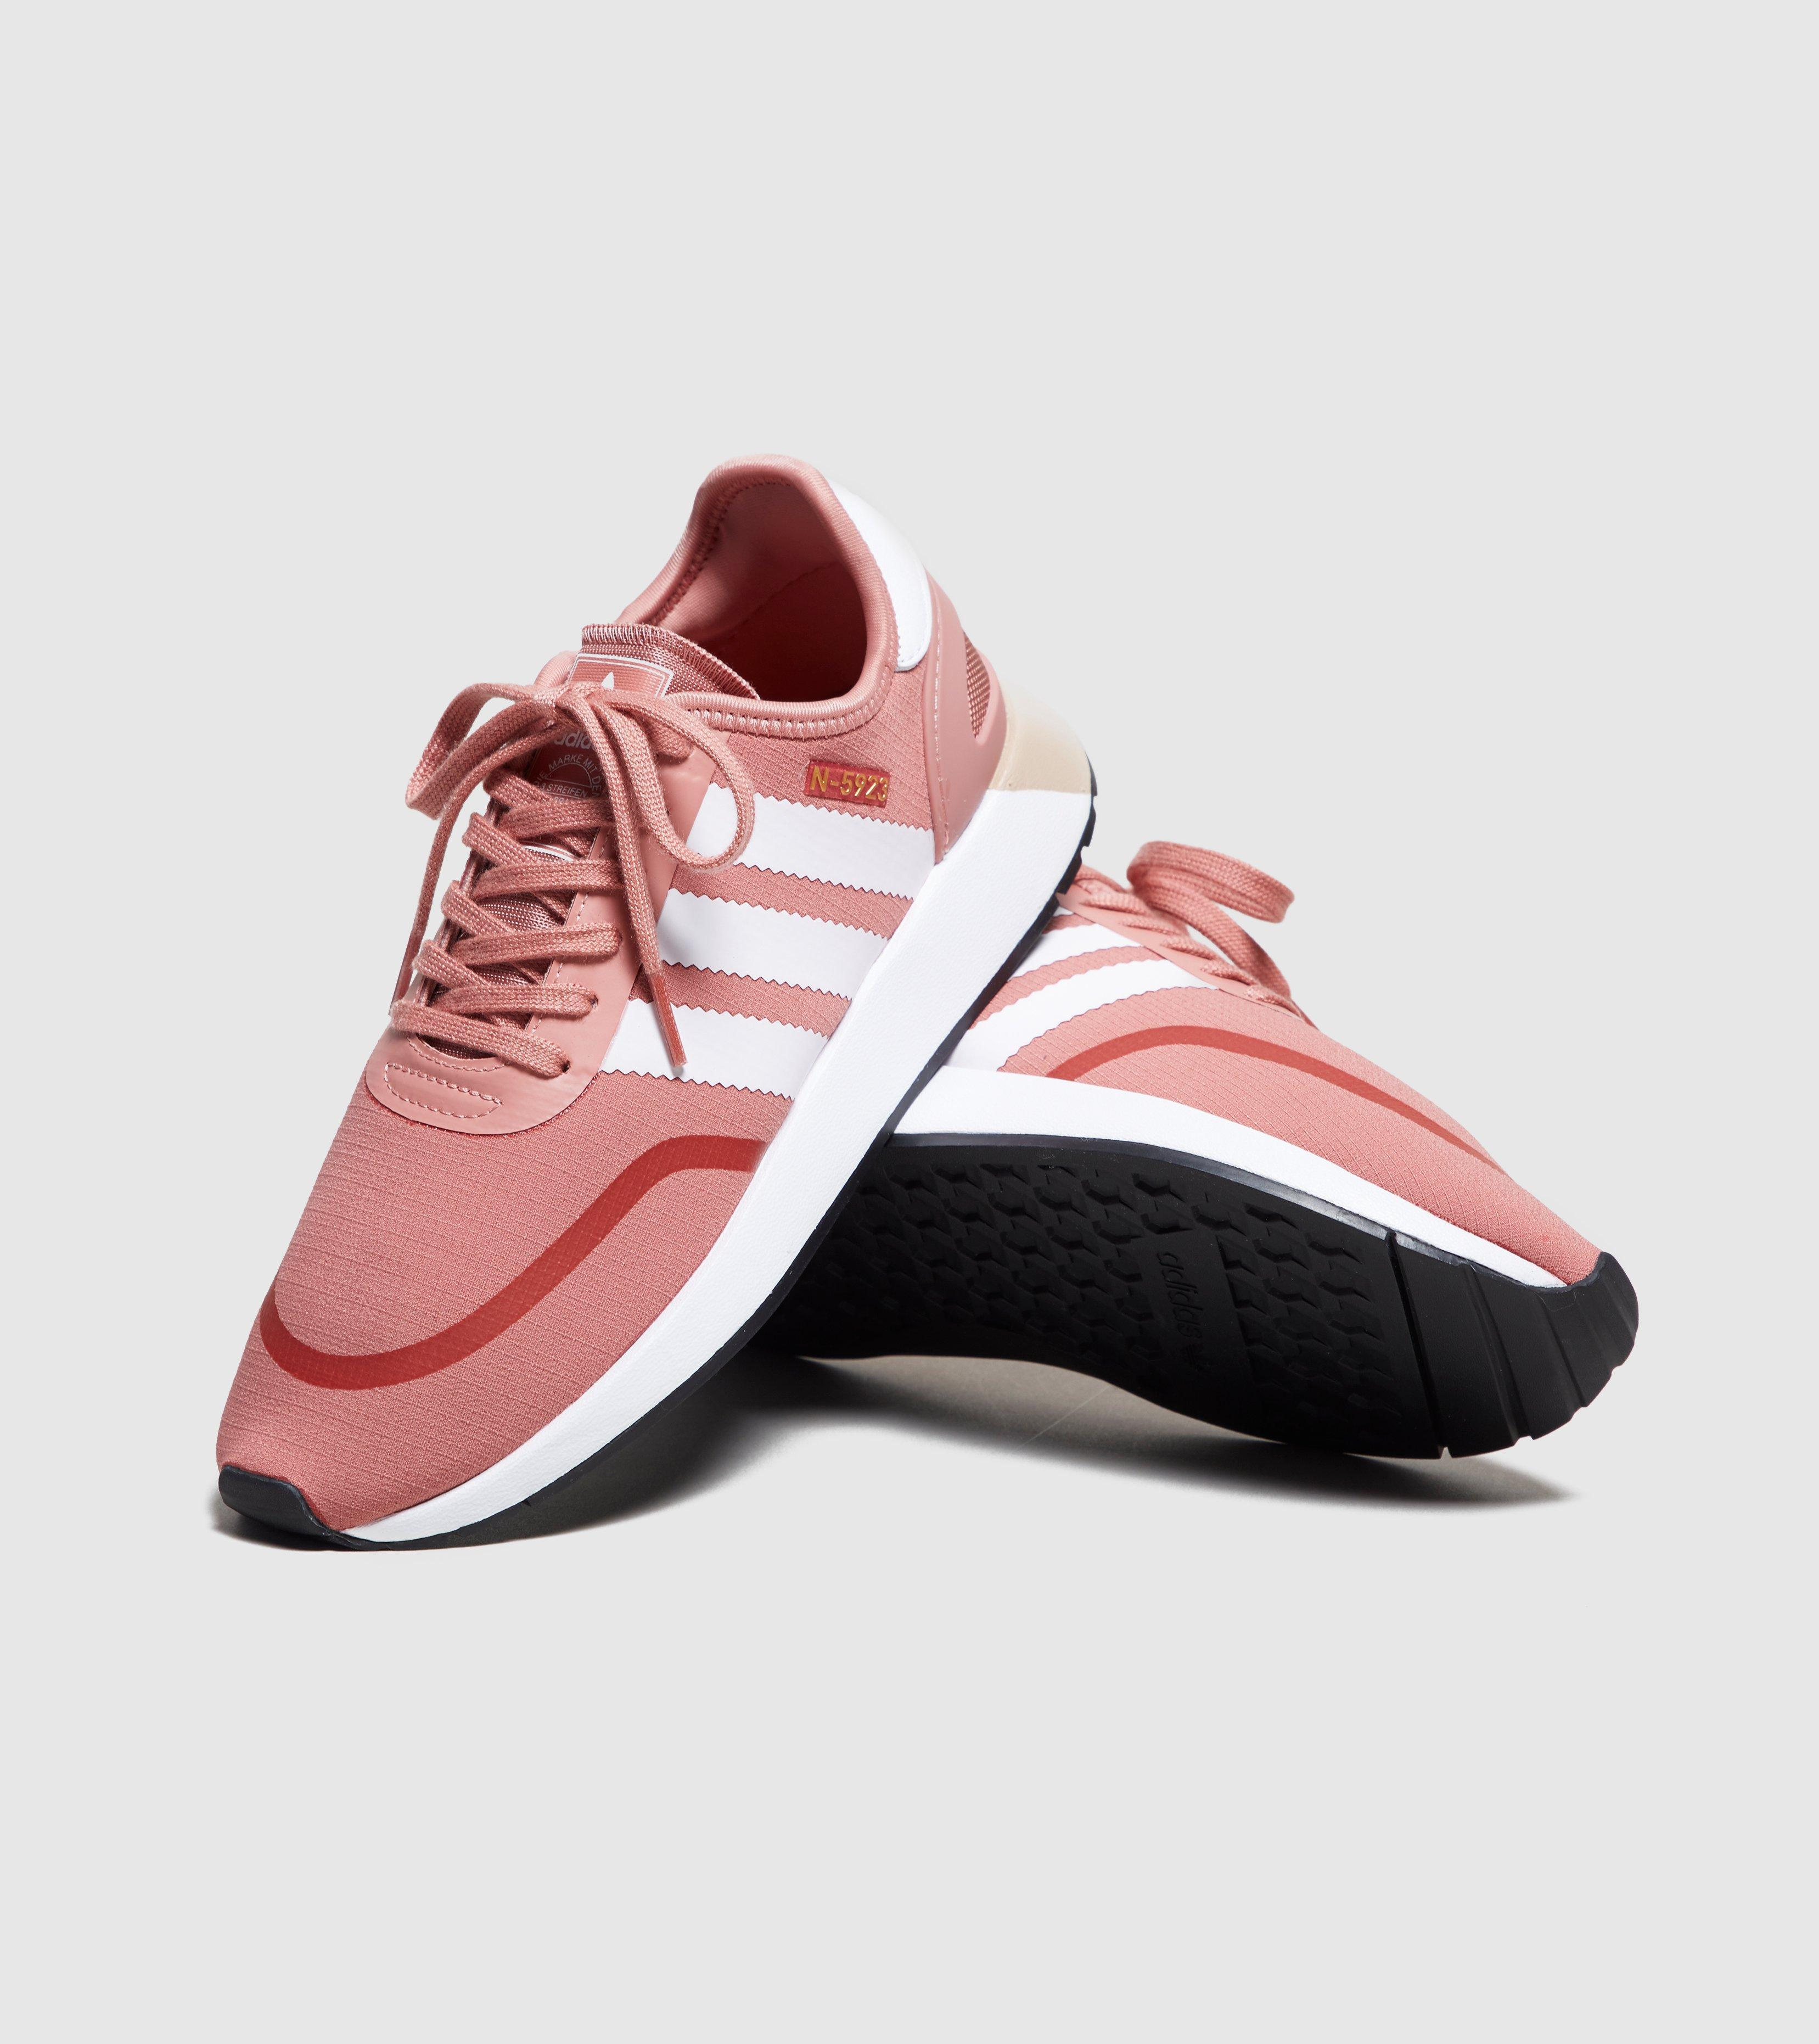 dec5fe75b79 Lyst - adidas Originals N-5923 Women s in Pink